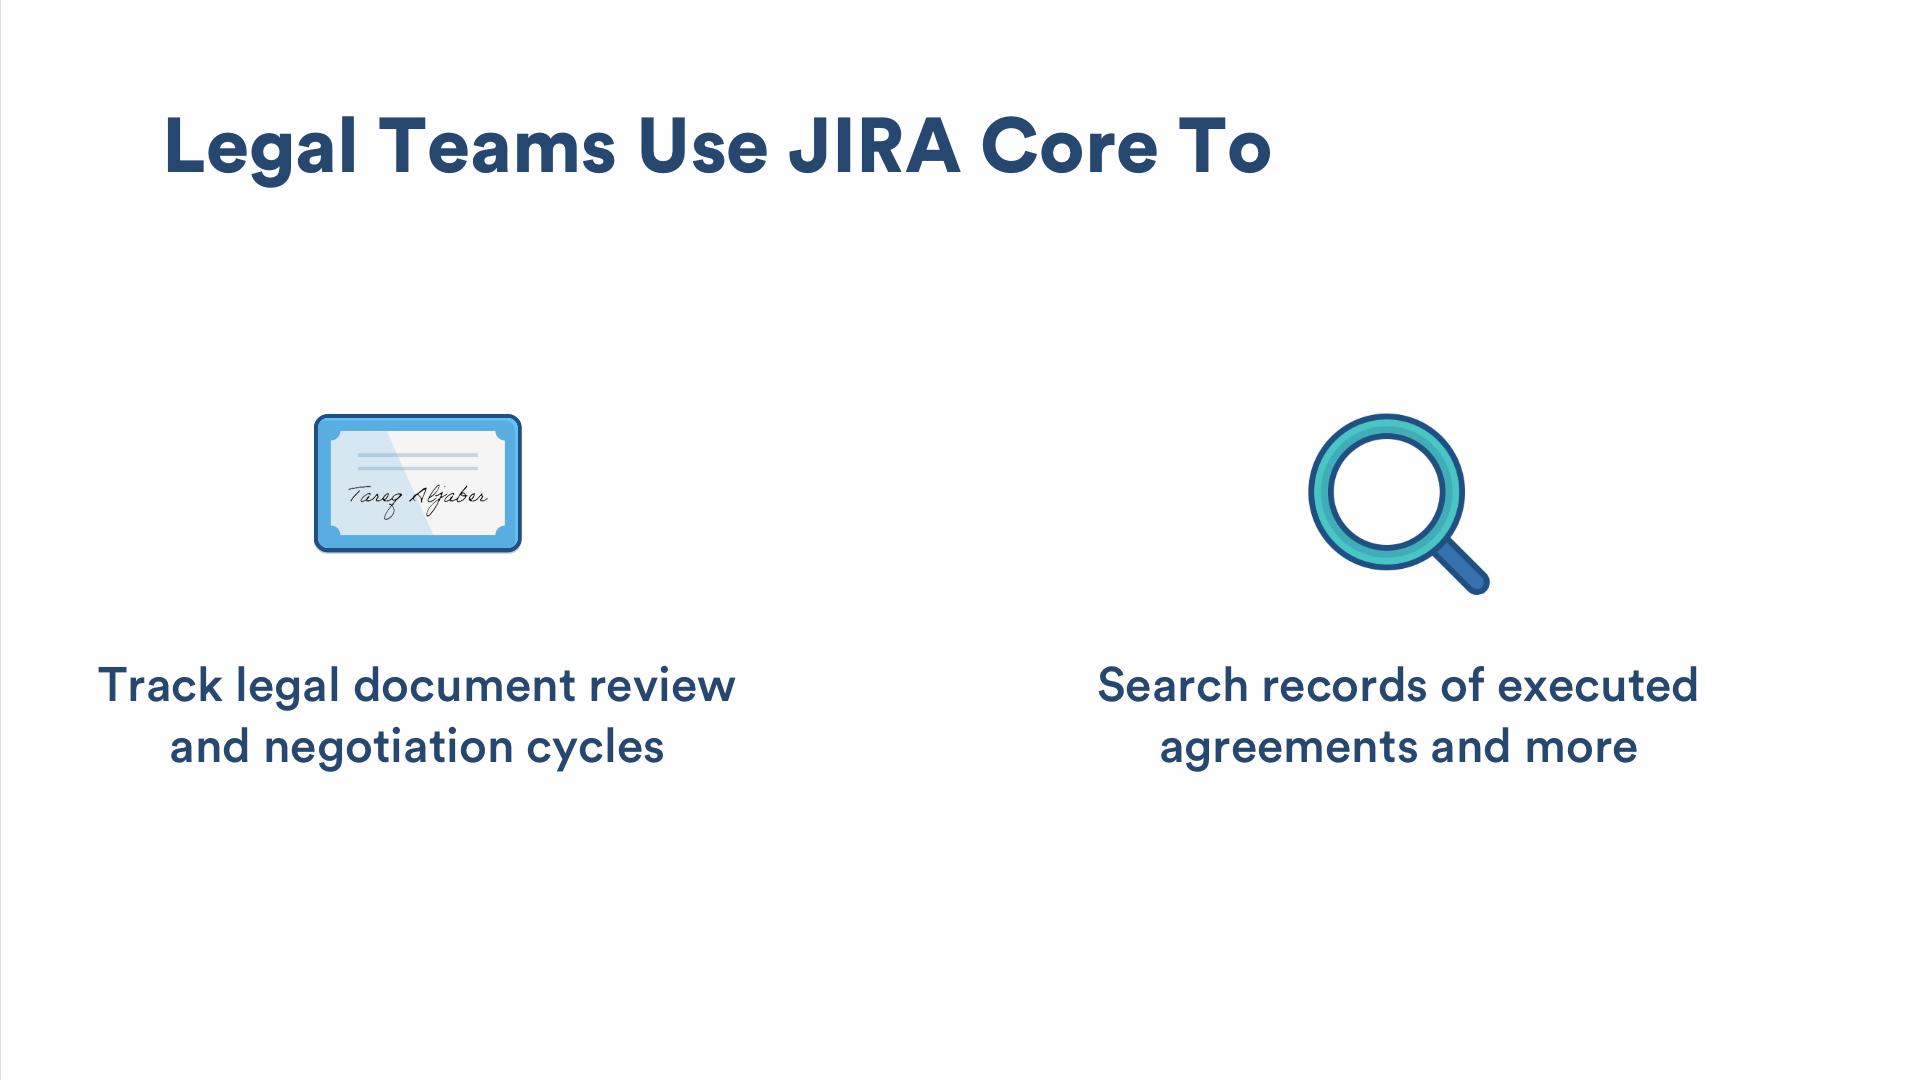 Jira Core に関するビデオを見る